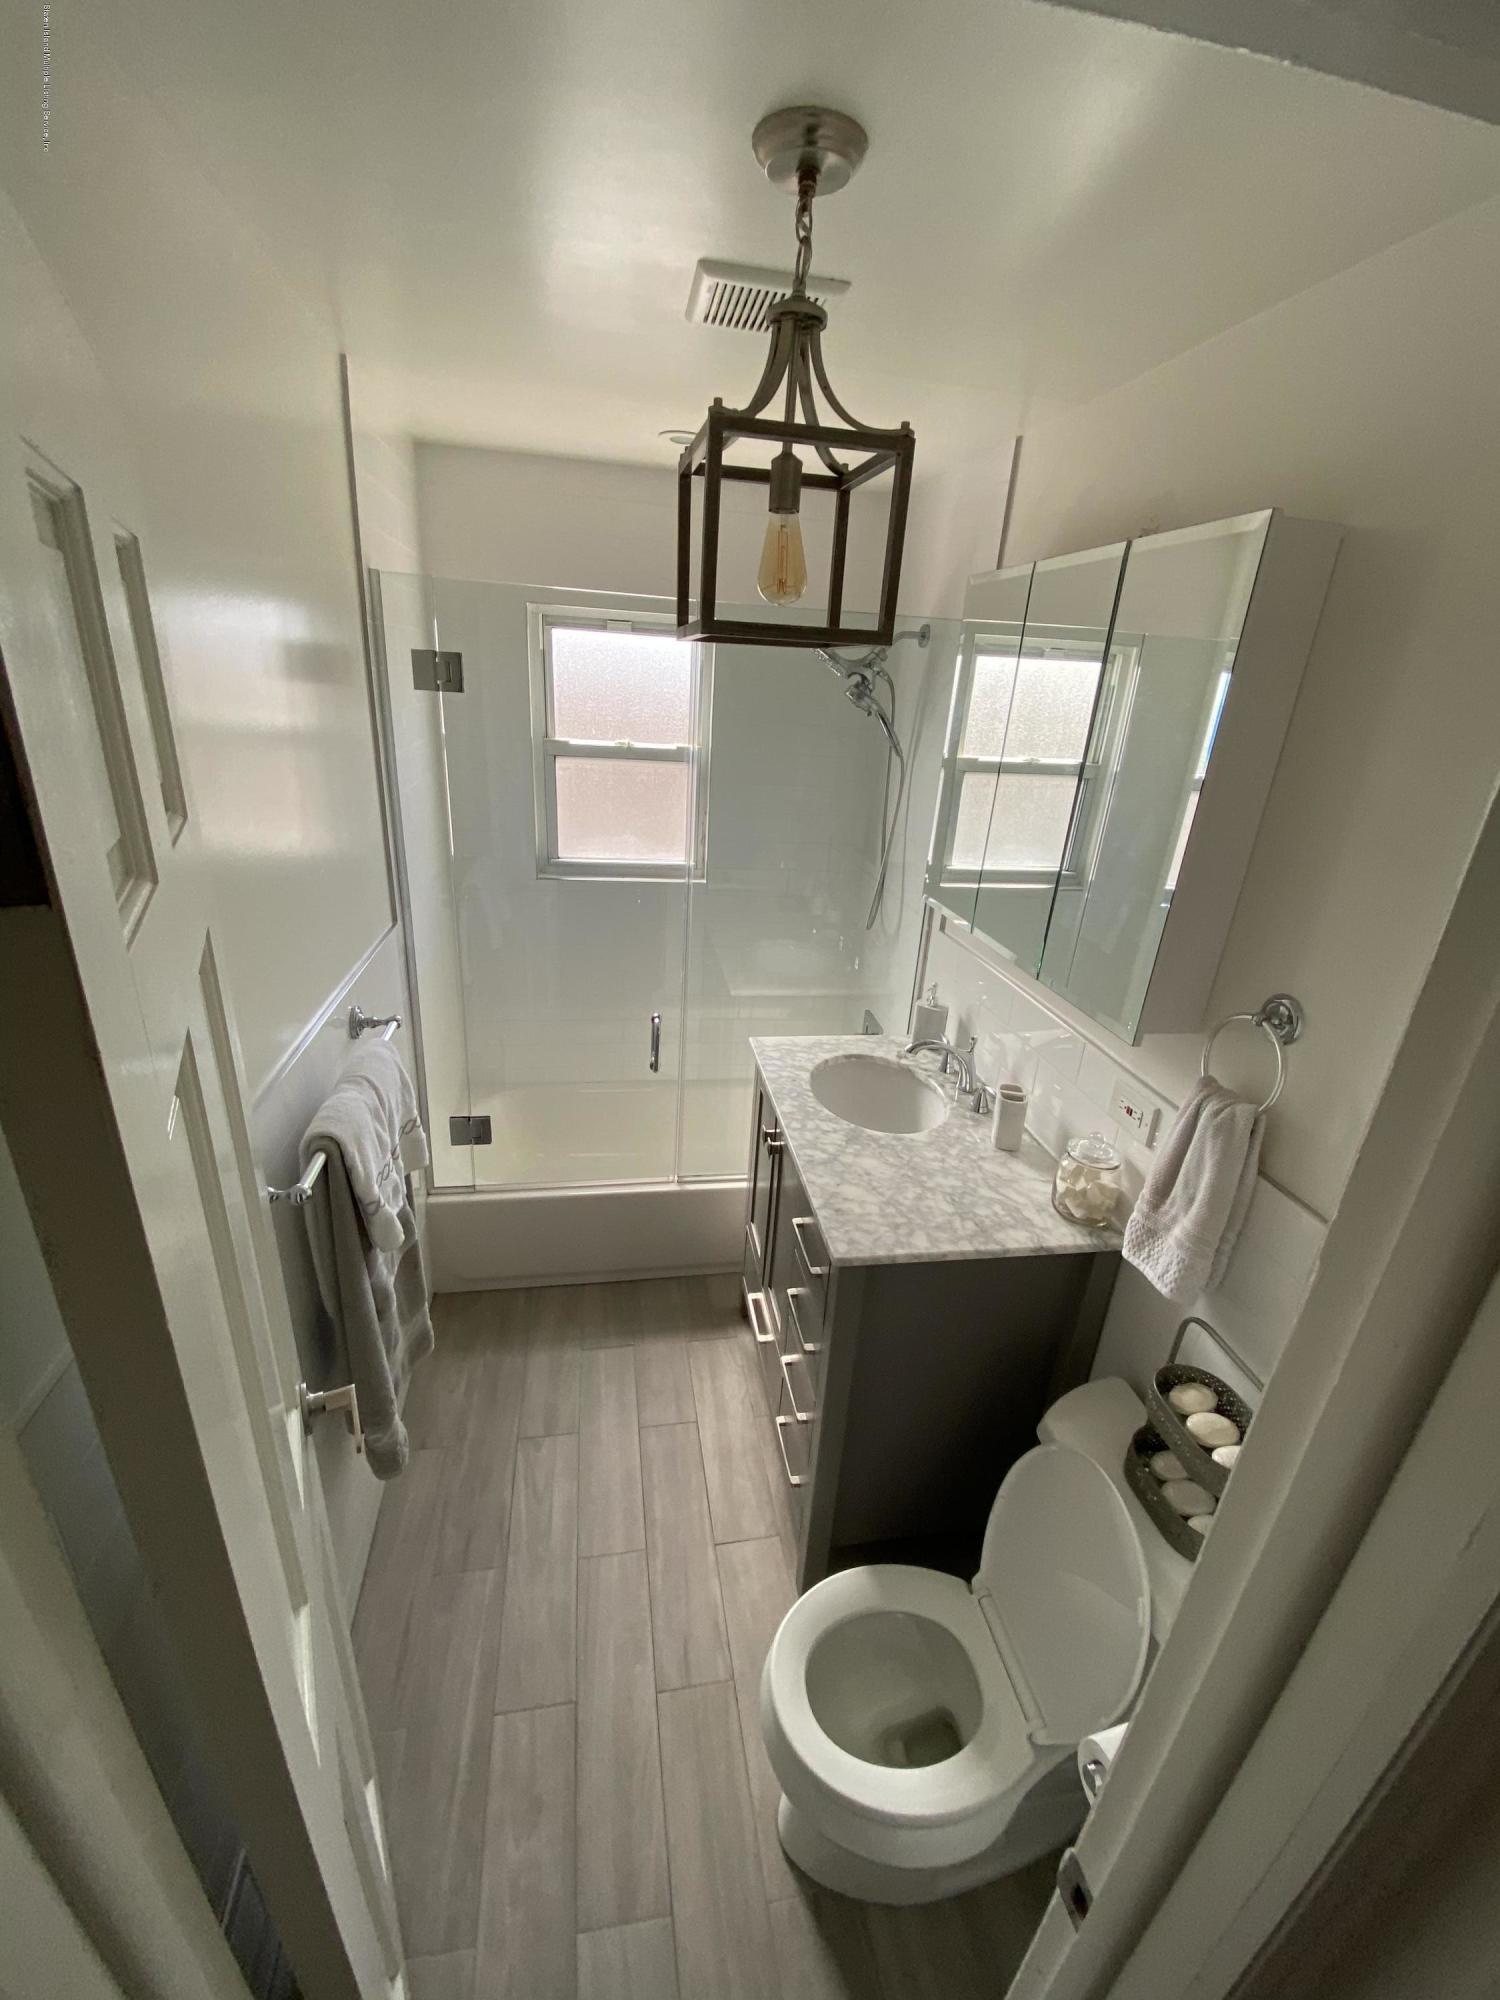 Single Family - Semi-Attached 370 Seaver Avenue  Staten Island, NY 10305, MLS-1136339-11